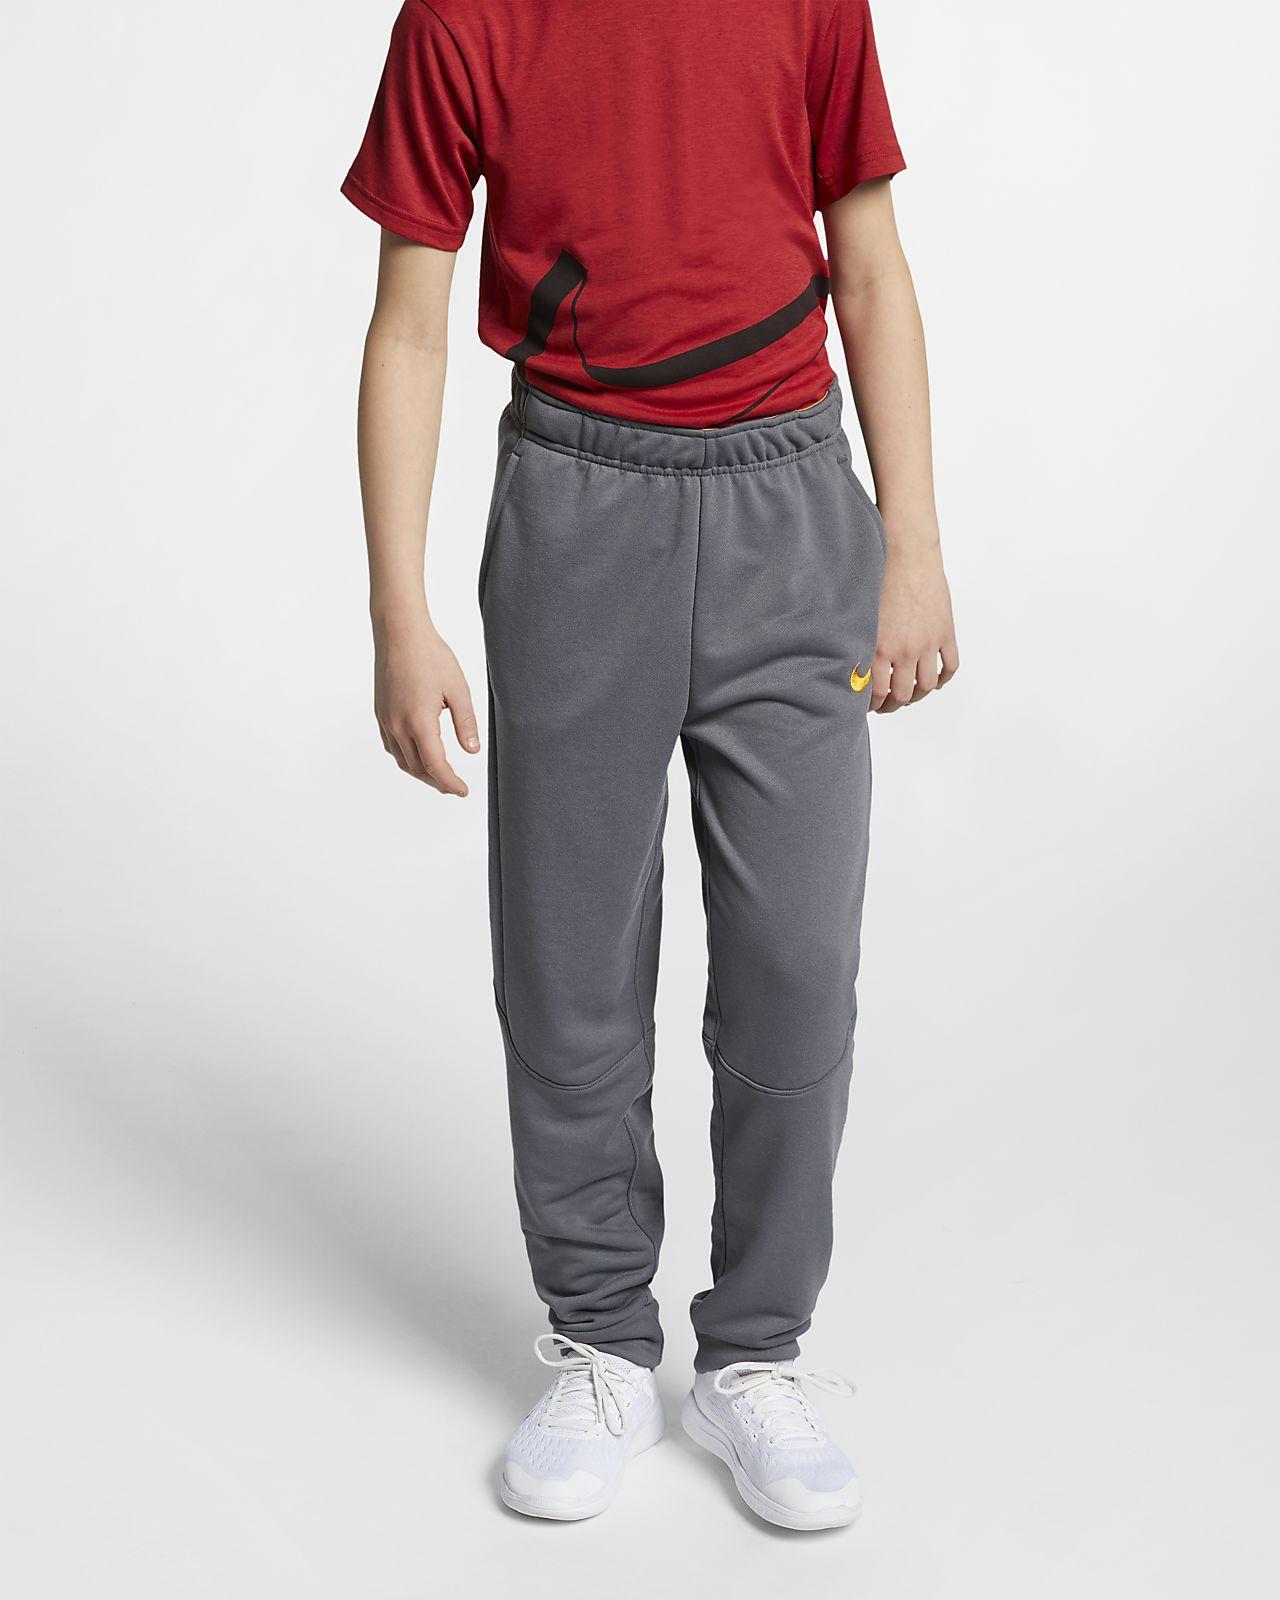 Nike Dri-FIT Trainingshose für ältere Kinder